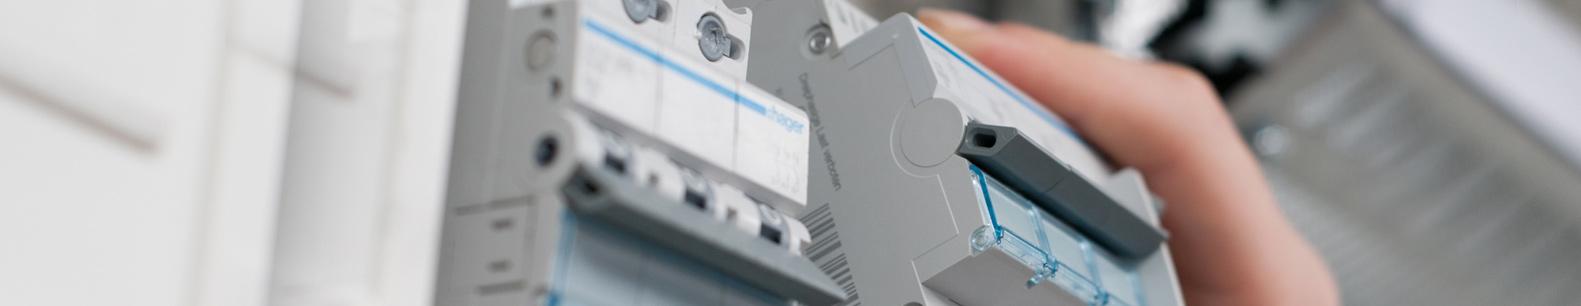 Elektro-Breitling GmbH Holzgerlingen